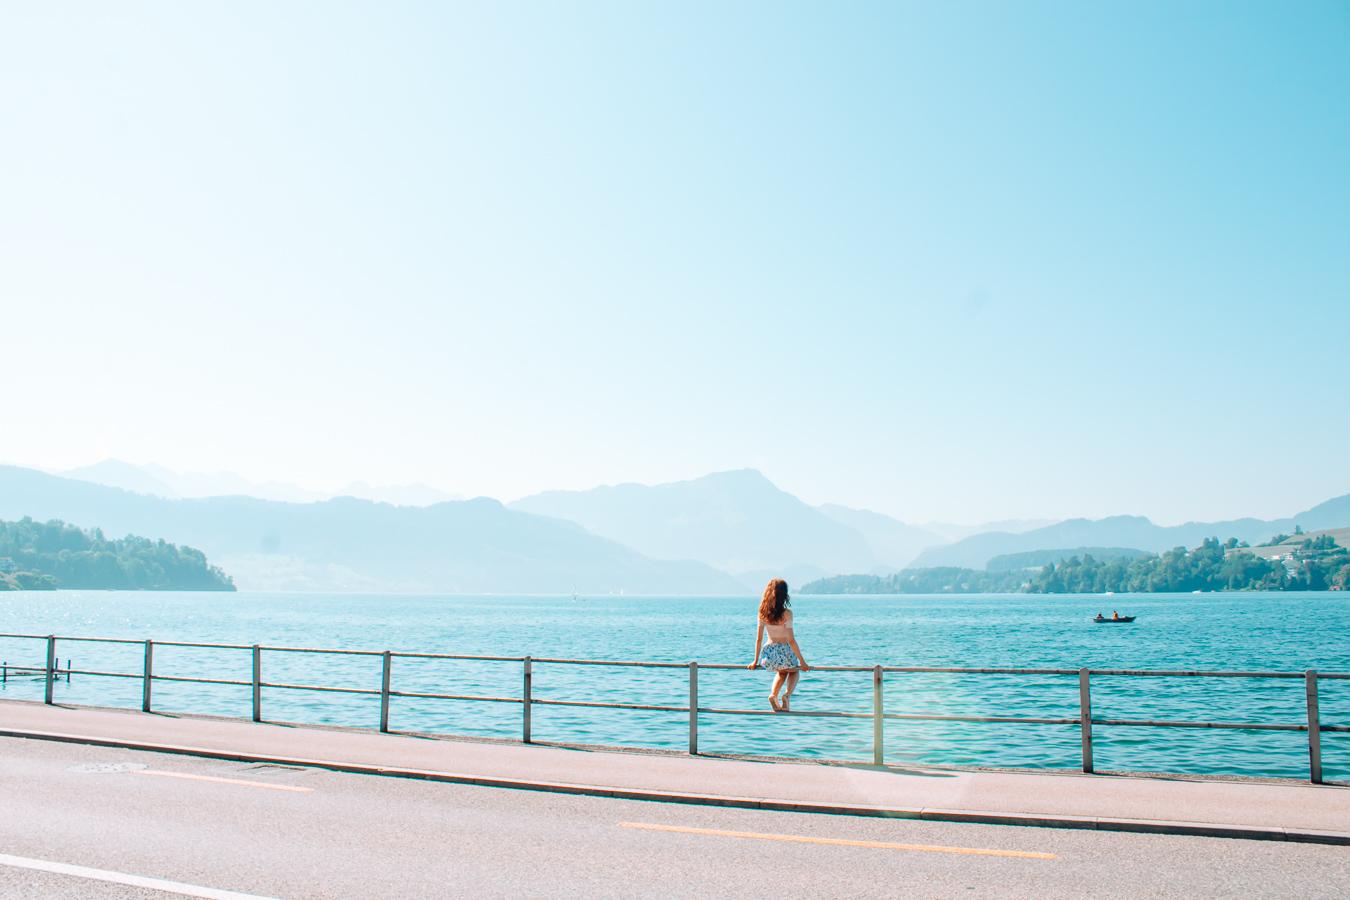 Lake Lucerne in Switzerland, Europe